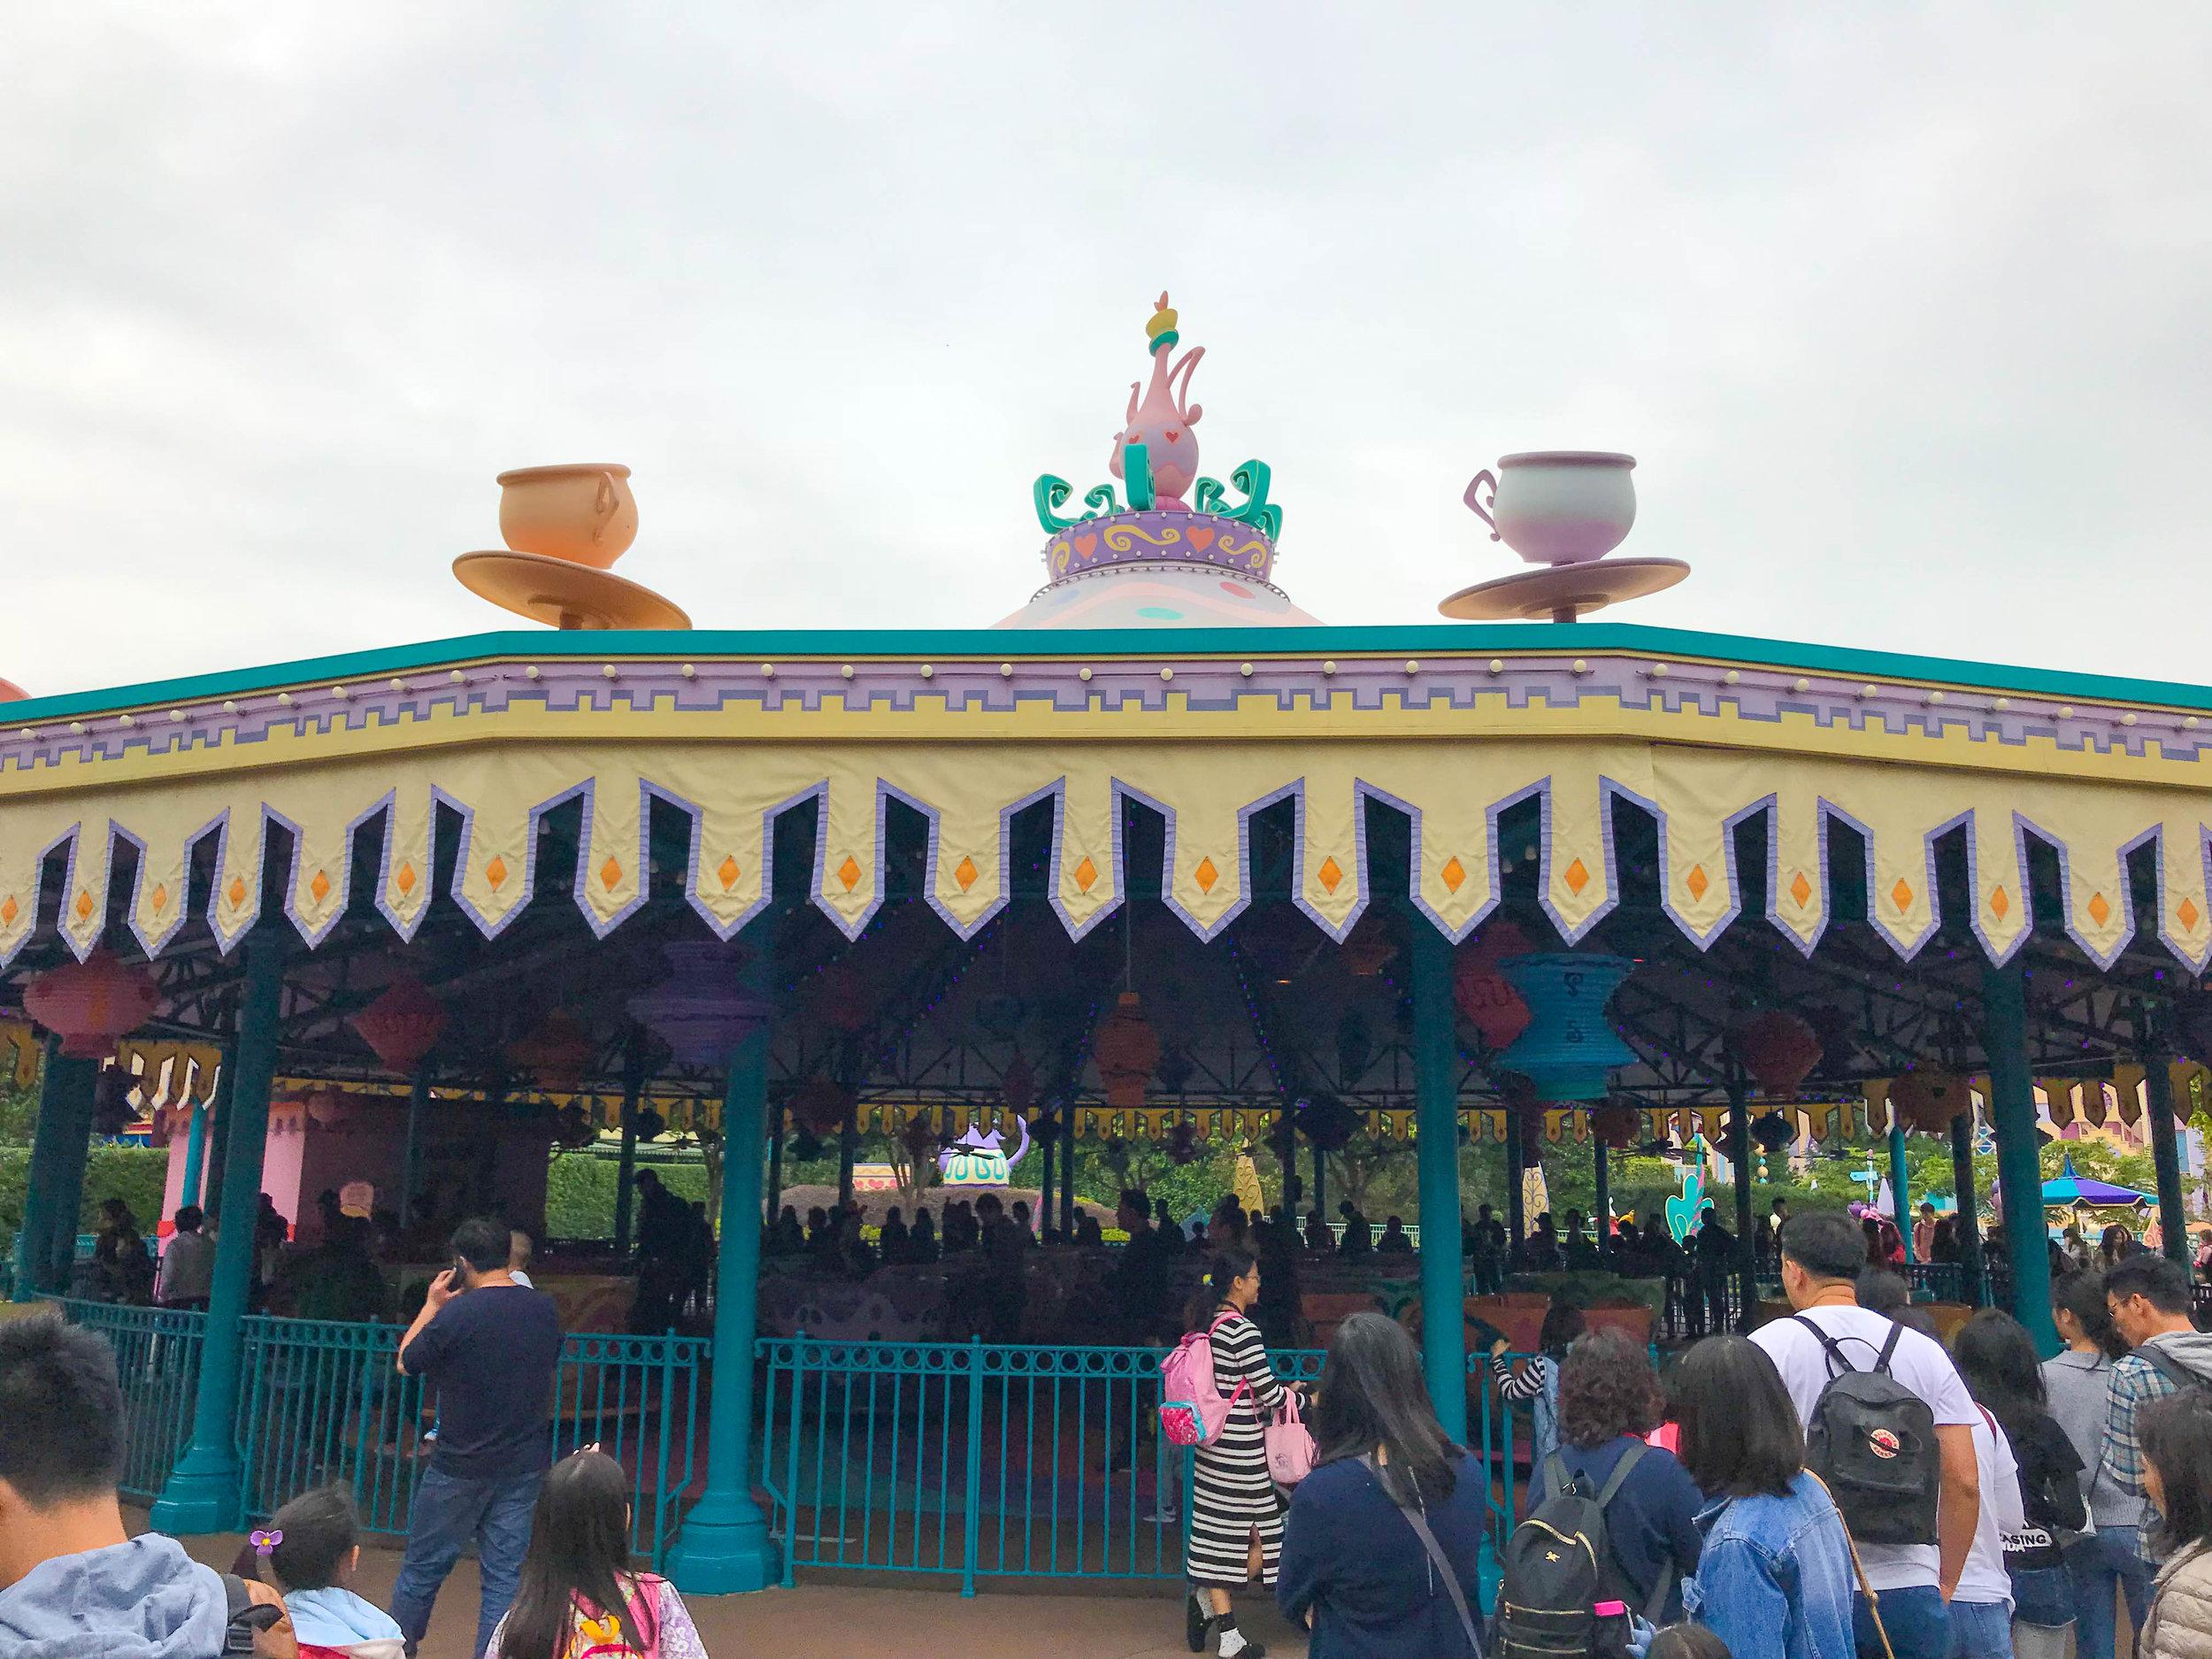 Hong Kong Disneyland - Fantasyland Tea Cups